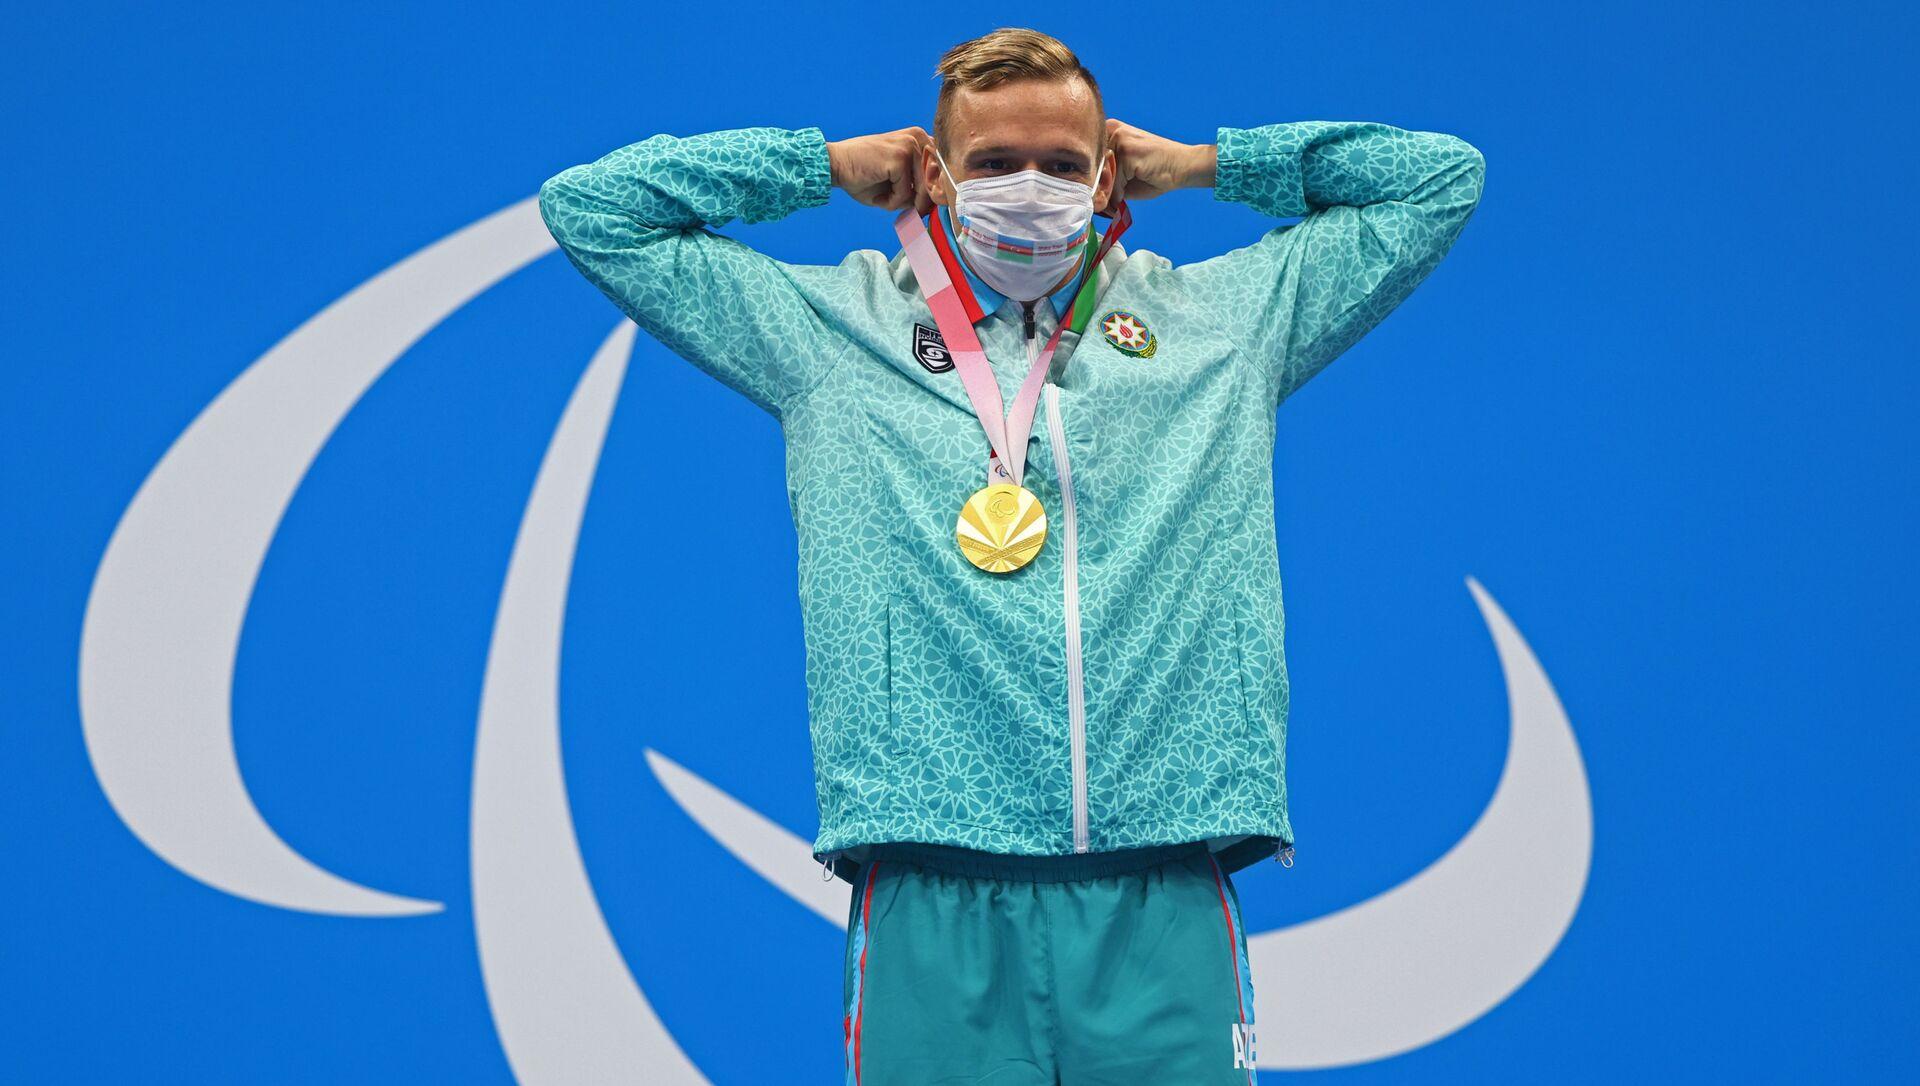 Азербайджанский пловец Роман Салех на церемонии награждения Паралимпийских игр Токио-2020 - Sputnik Азербайджан, 1920, 29.08.2021